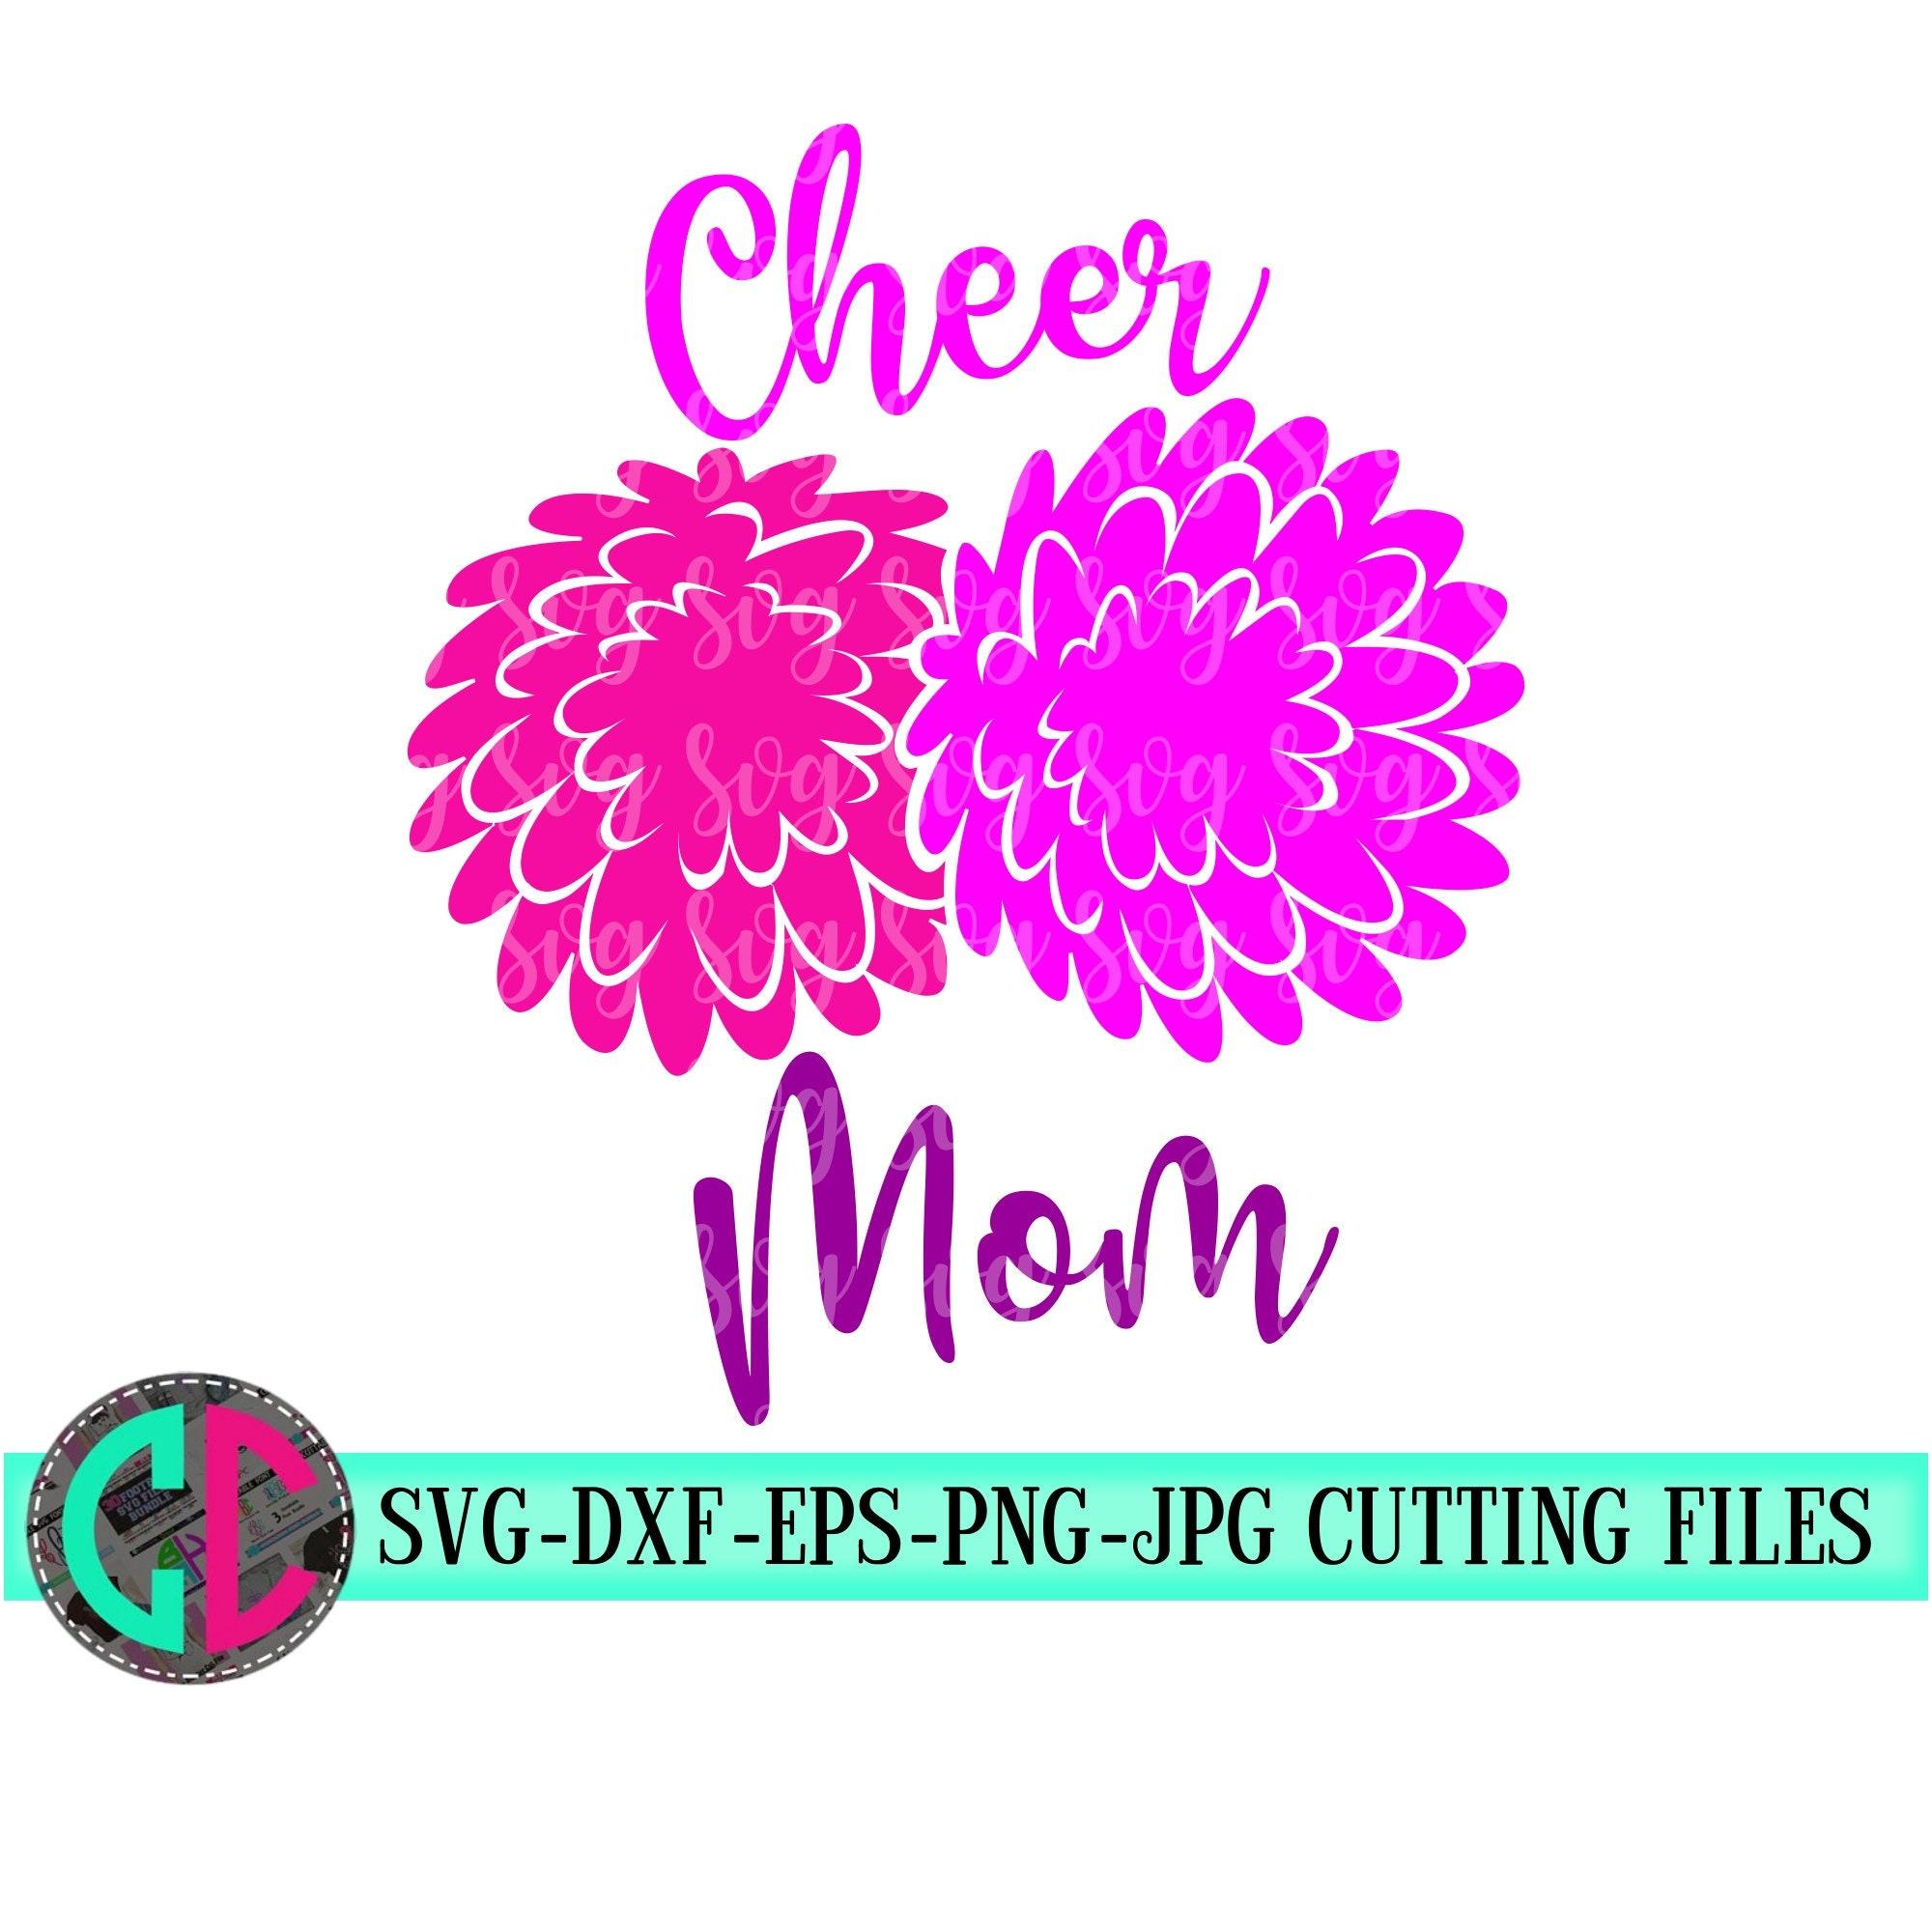 Cheer Mom Pom Pom Svg Cheer Mom Svg Cheerleader Svg Football Svg Cheerleader Cut File Football Mom Svg Svg For Cricut Eps Dxf